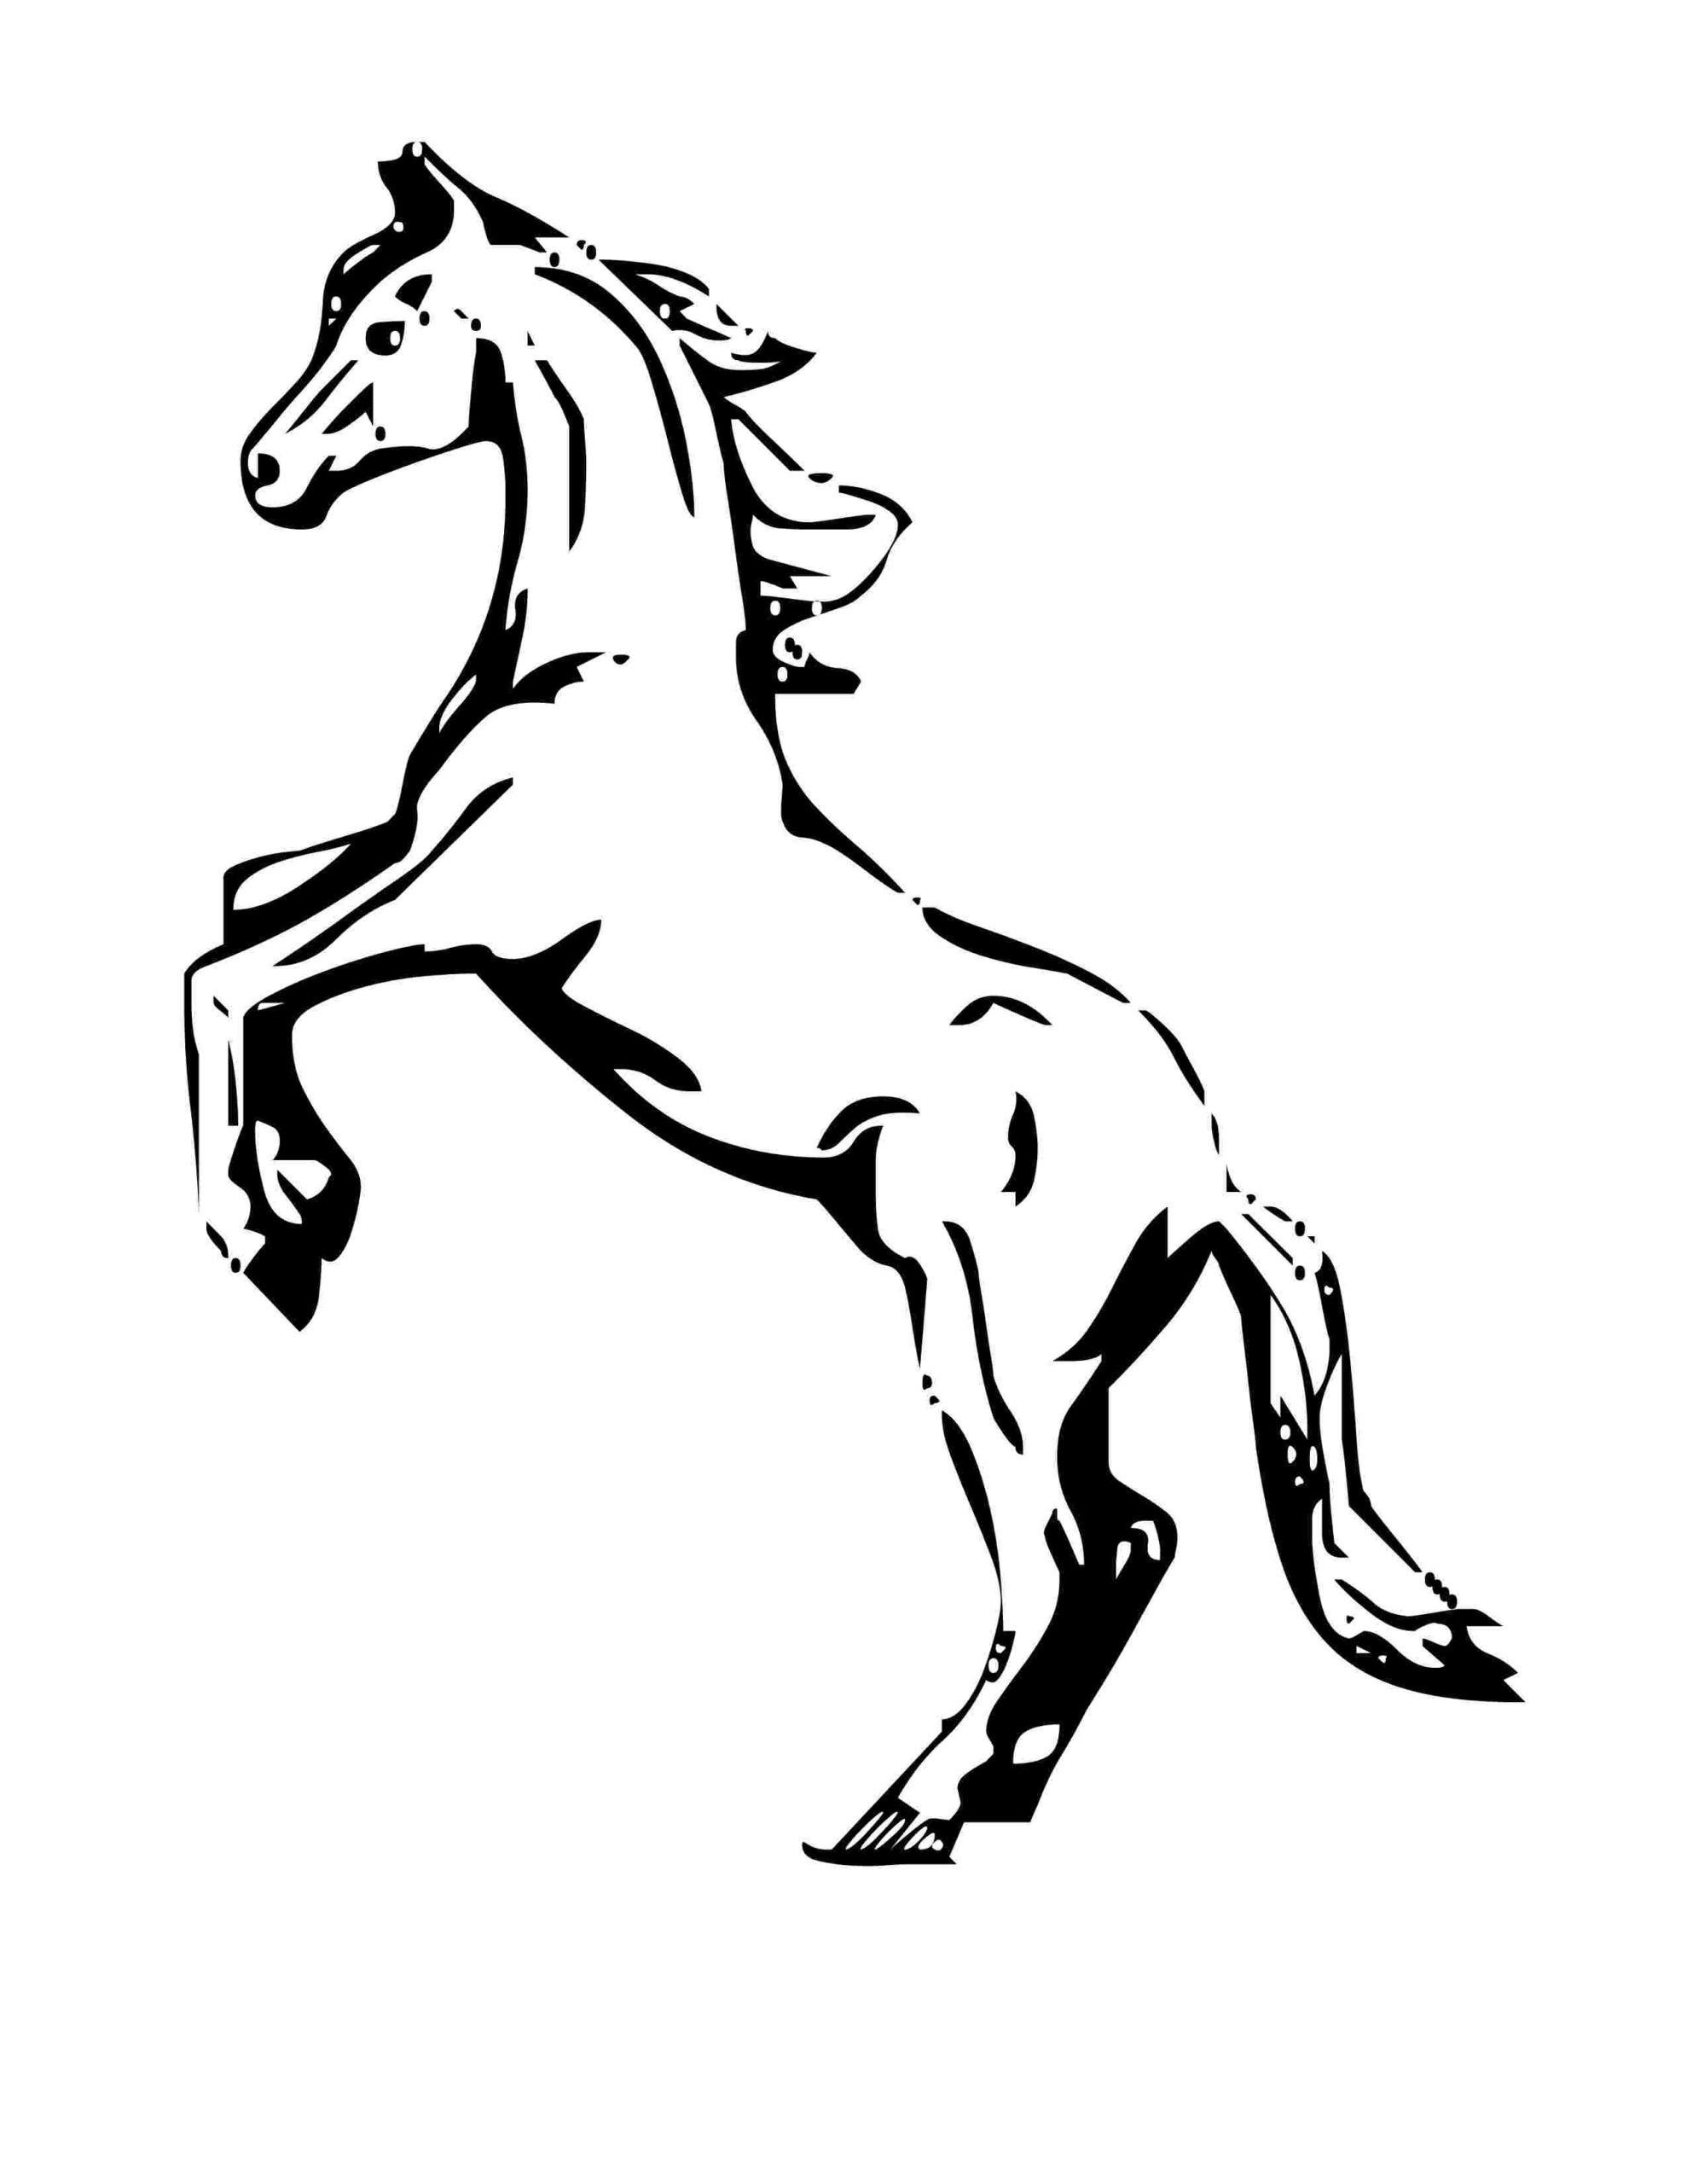 Baby Horse Coloring Page Youngandtae Com Caballos Salvajes Caballo Para Colorear Pinturas [ 2560 x 1978 Pixel ]